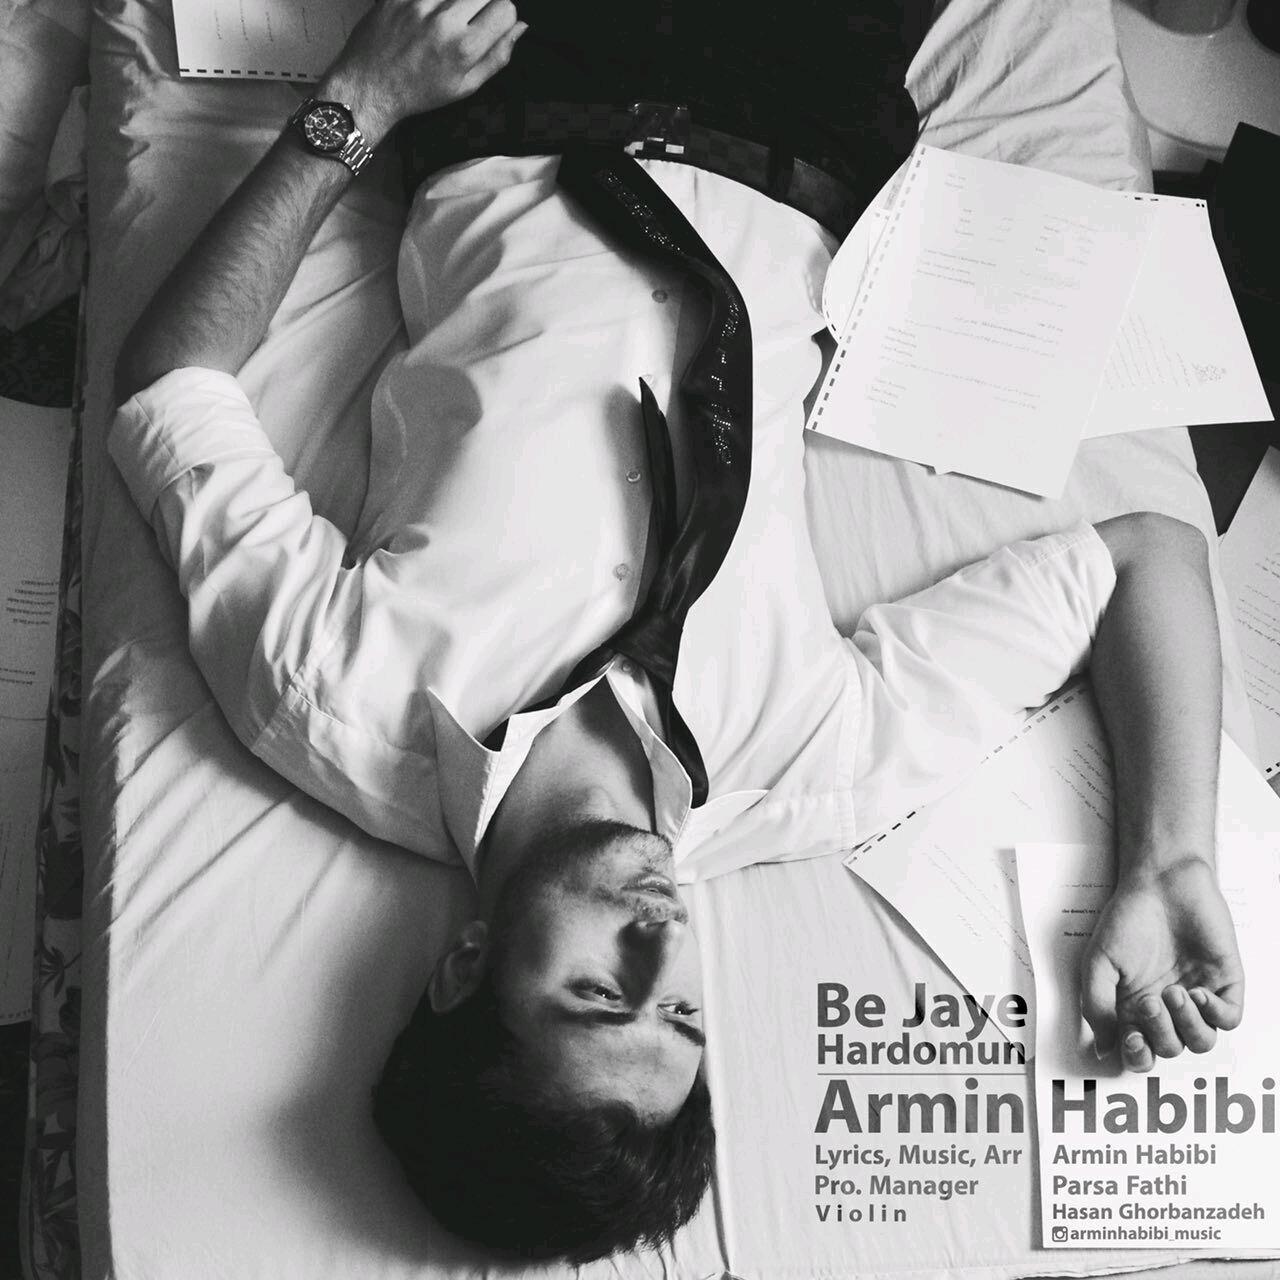 Armin Habibi – Be Jaye Hardomun